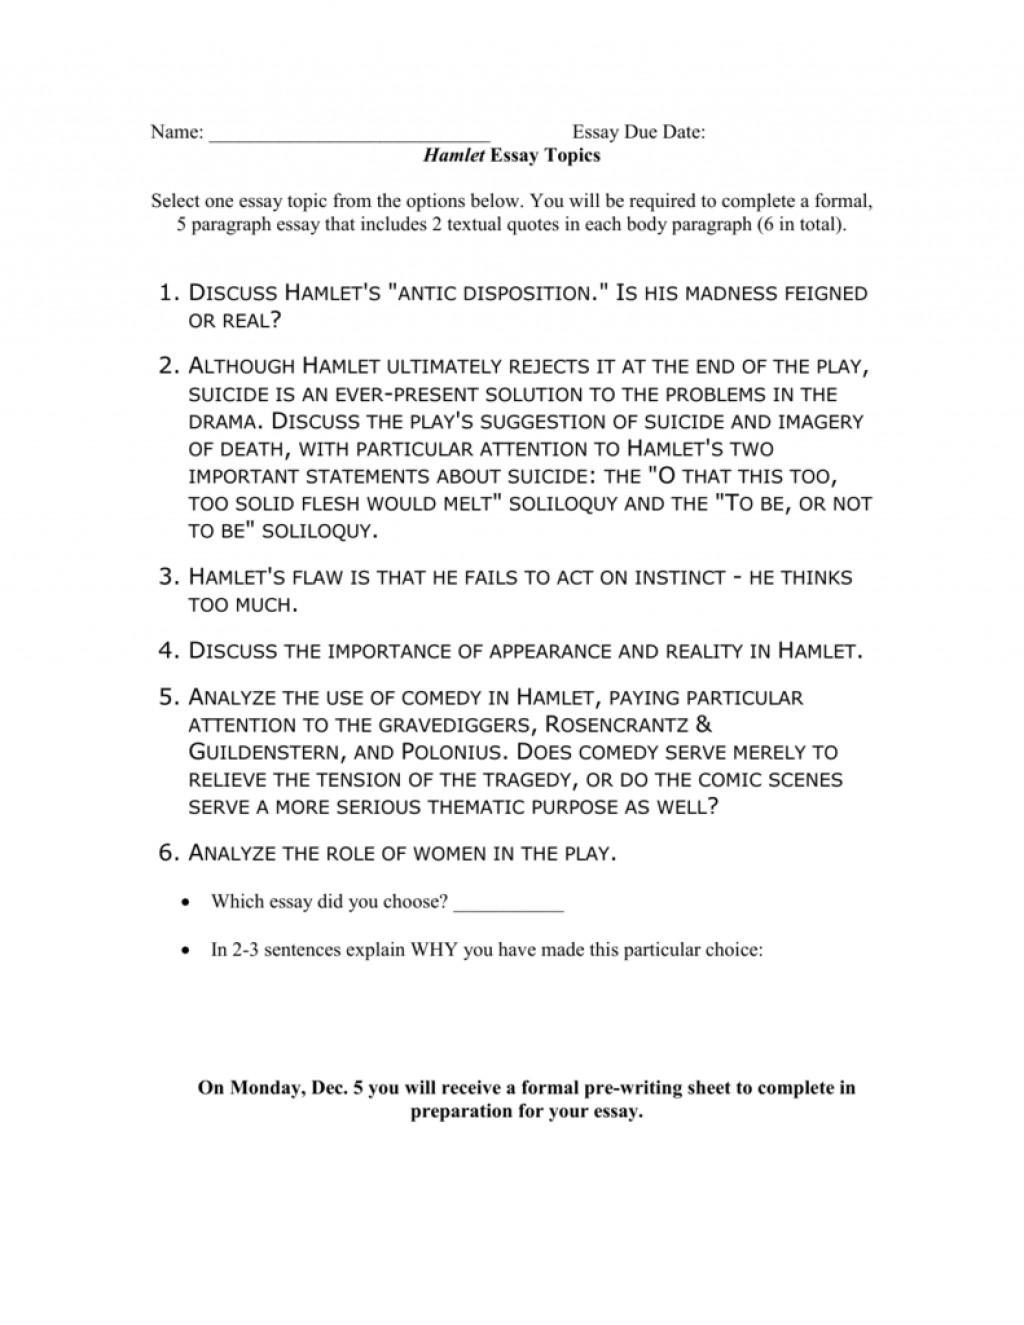 001 008023648 1 Essay Example Hamlet Rare Topics Ophelia Act Ap Literature Prompt Large